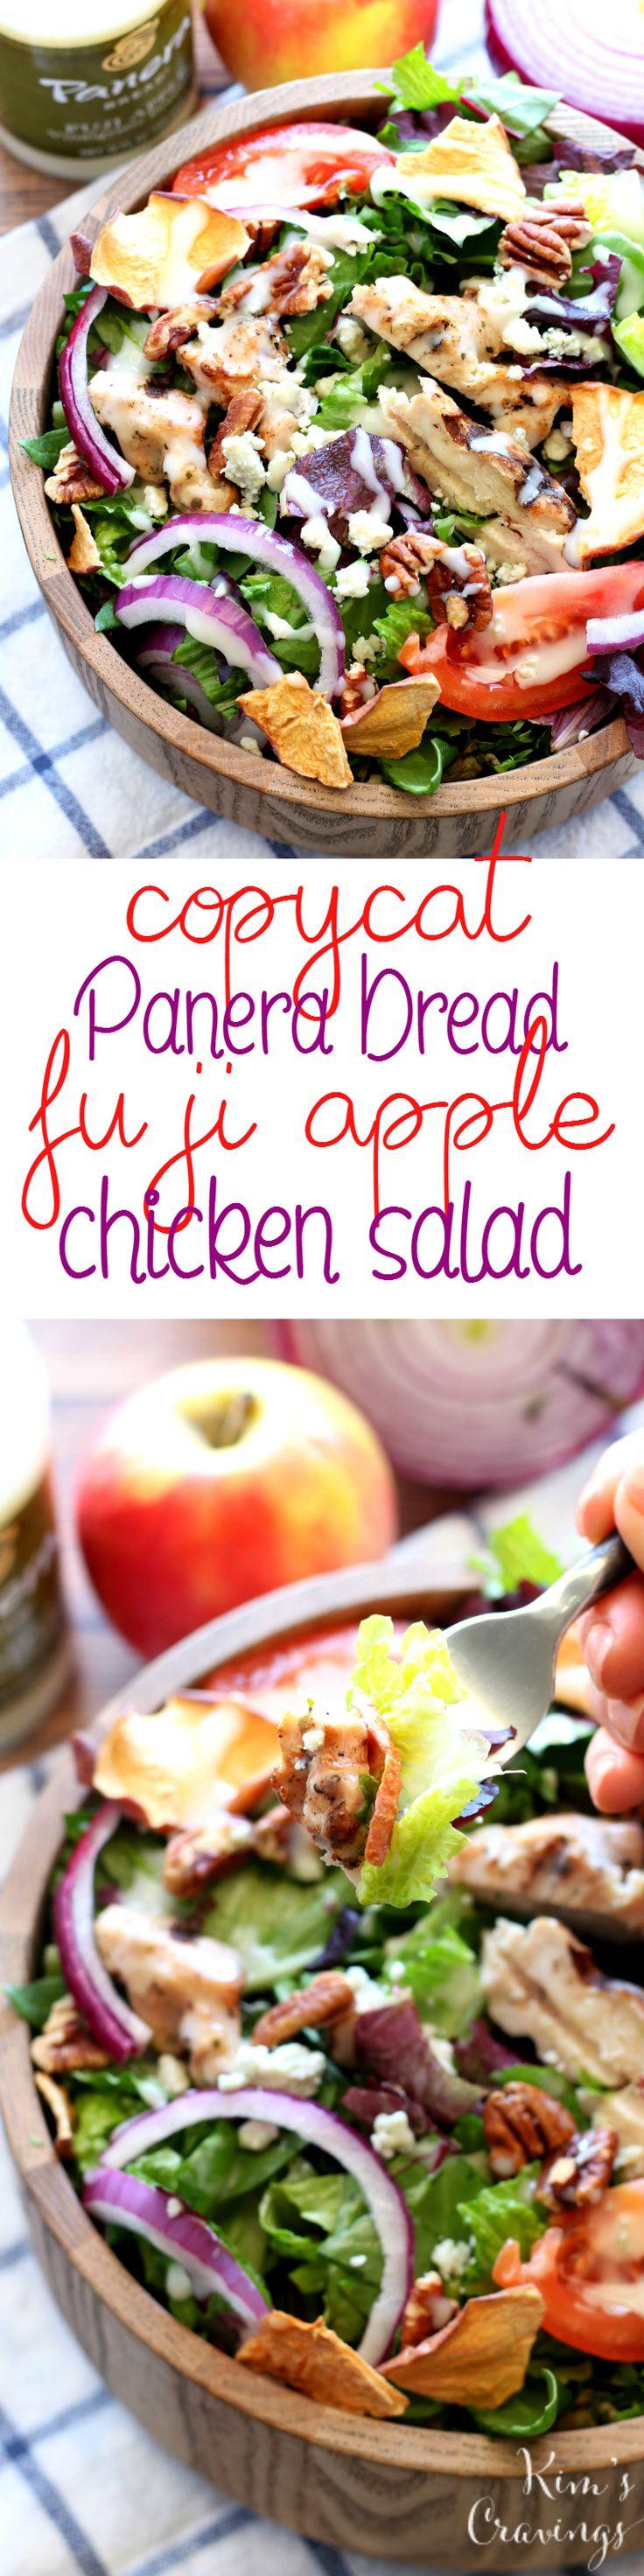 Calories in Cranberry Chicken Salad (Sandwich) - Calorie ...